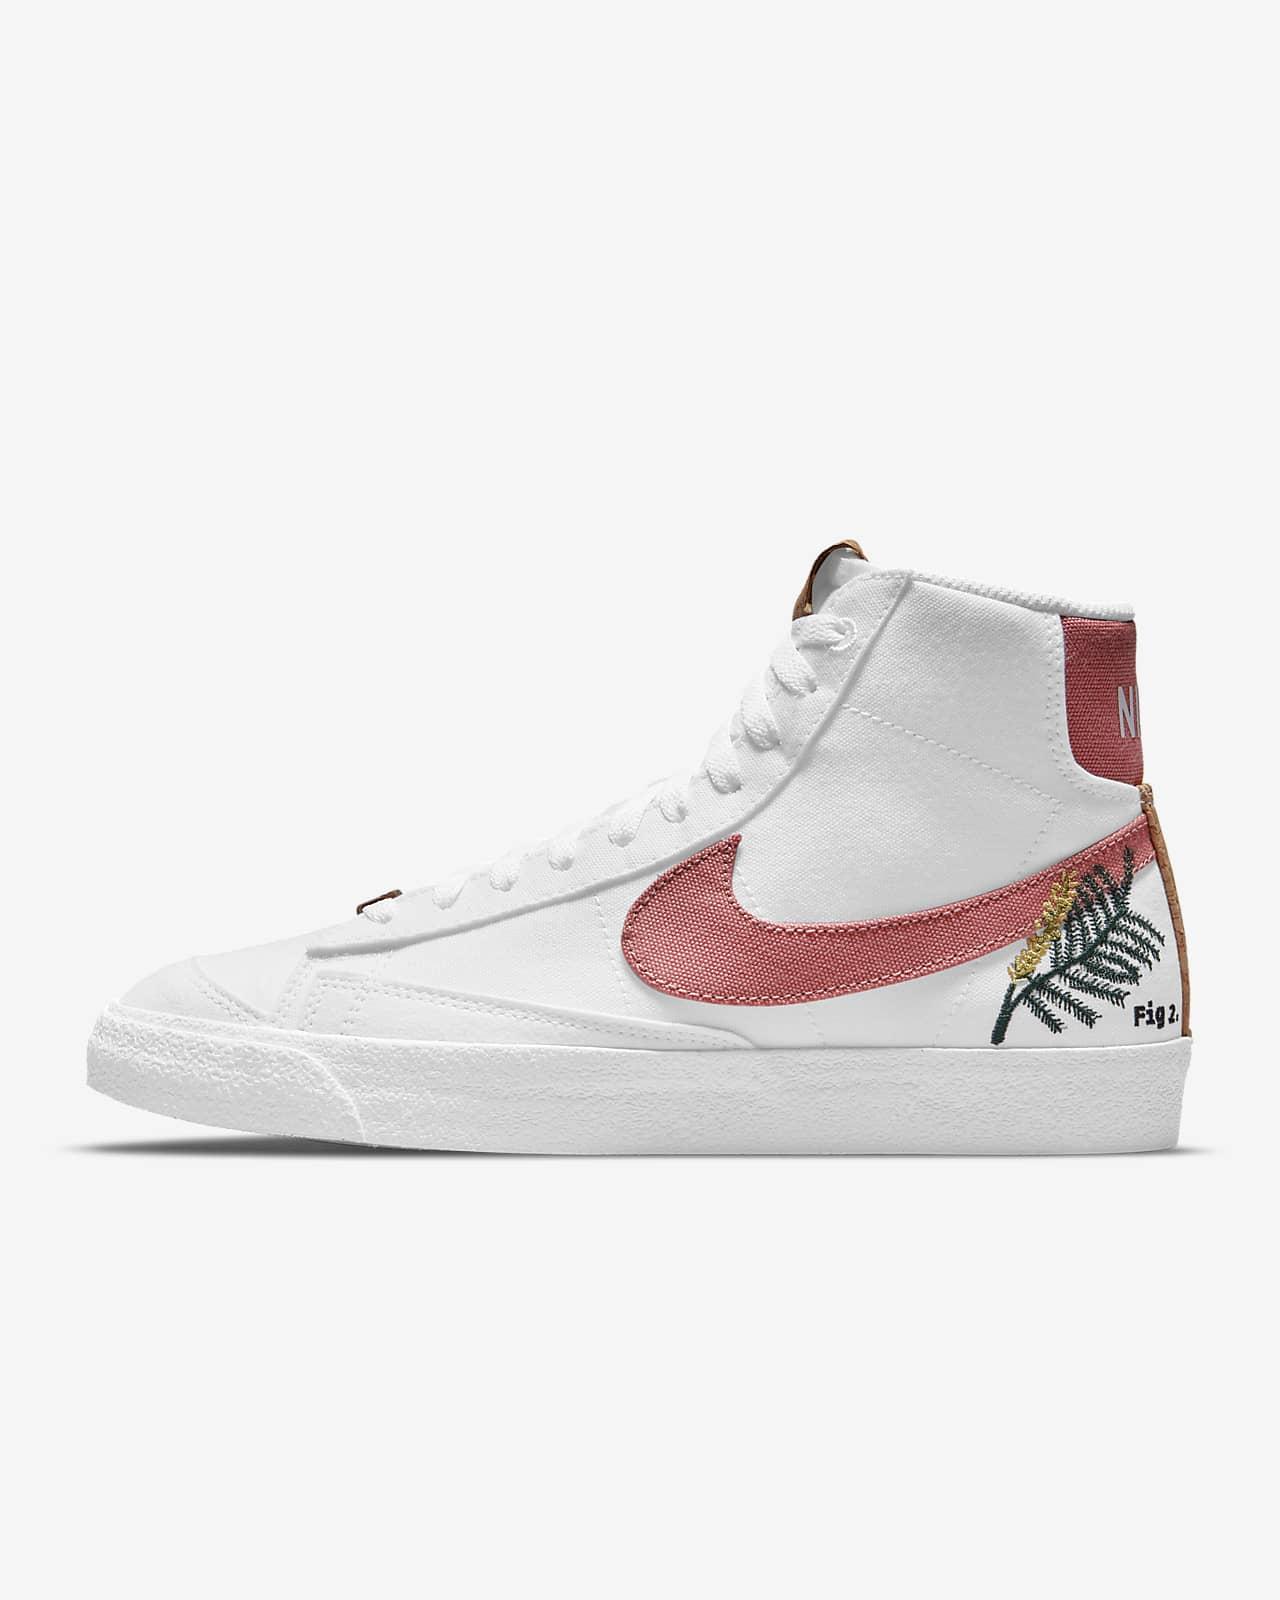 Sko Nike Blazer Mid '77 SE för kvinnor